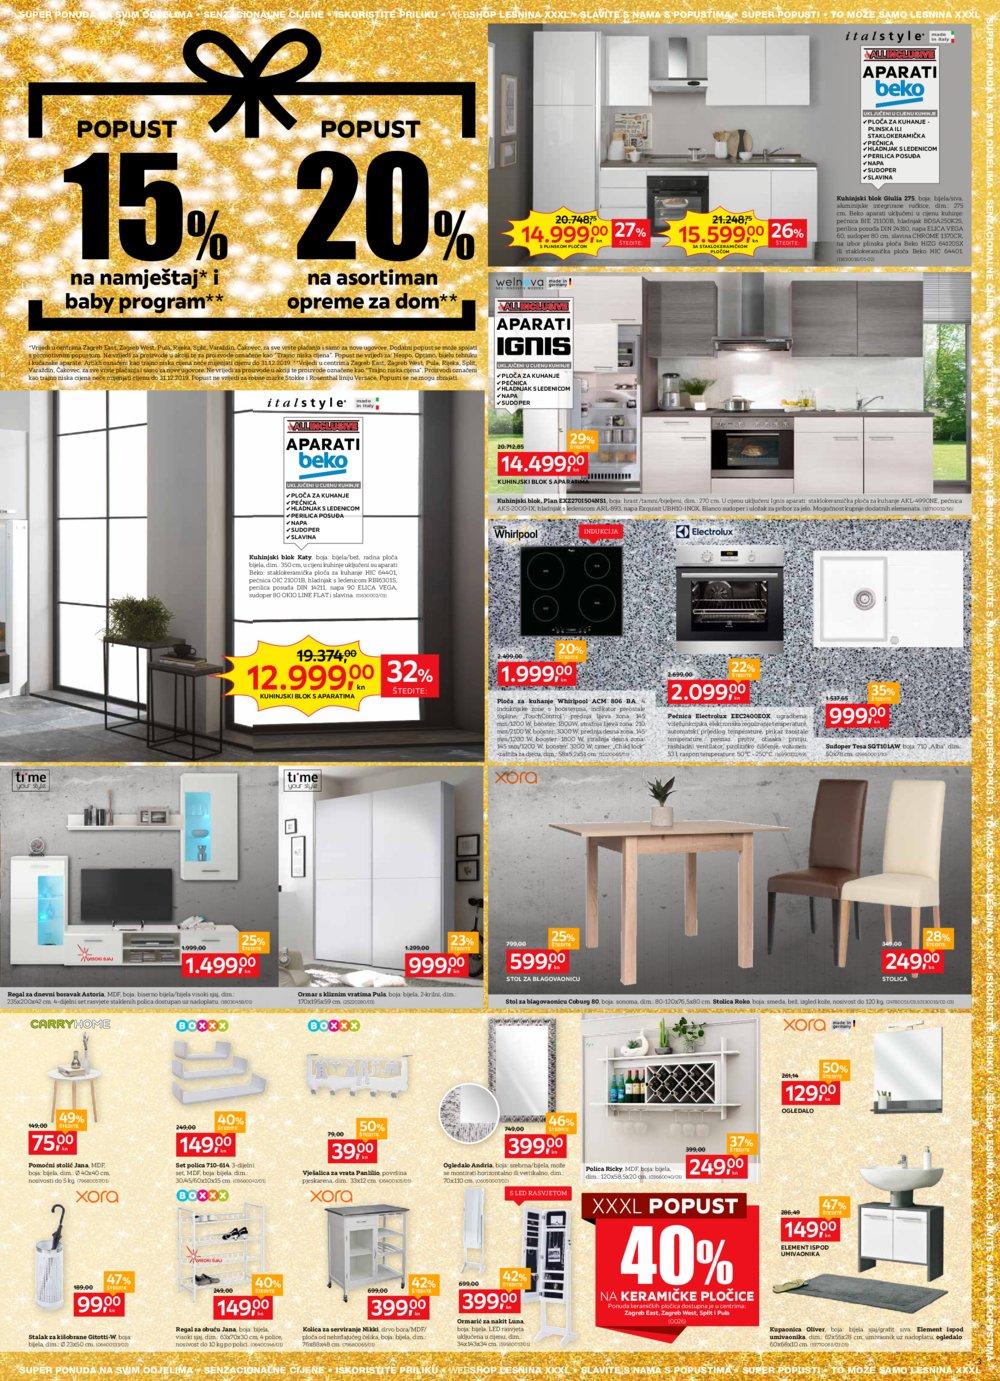 Lesnina 5. godišnjica katalog 15.11.-18.11.2019.